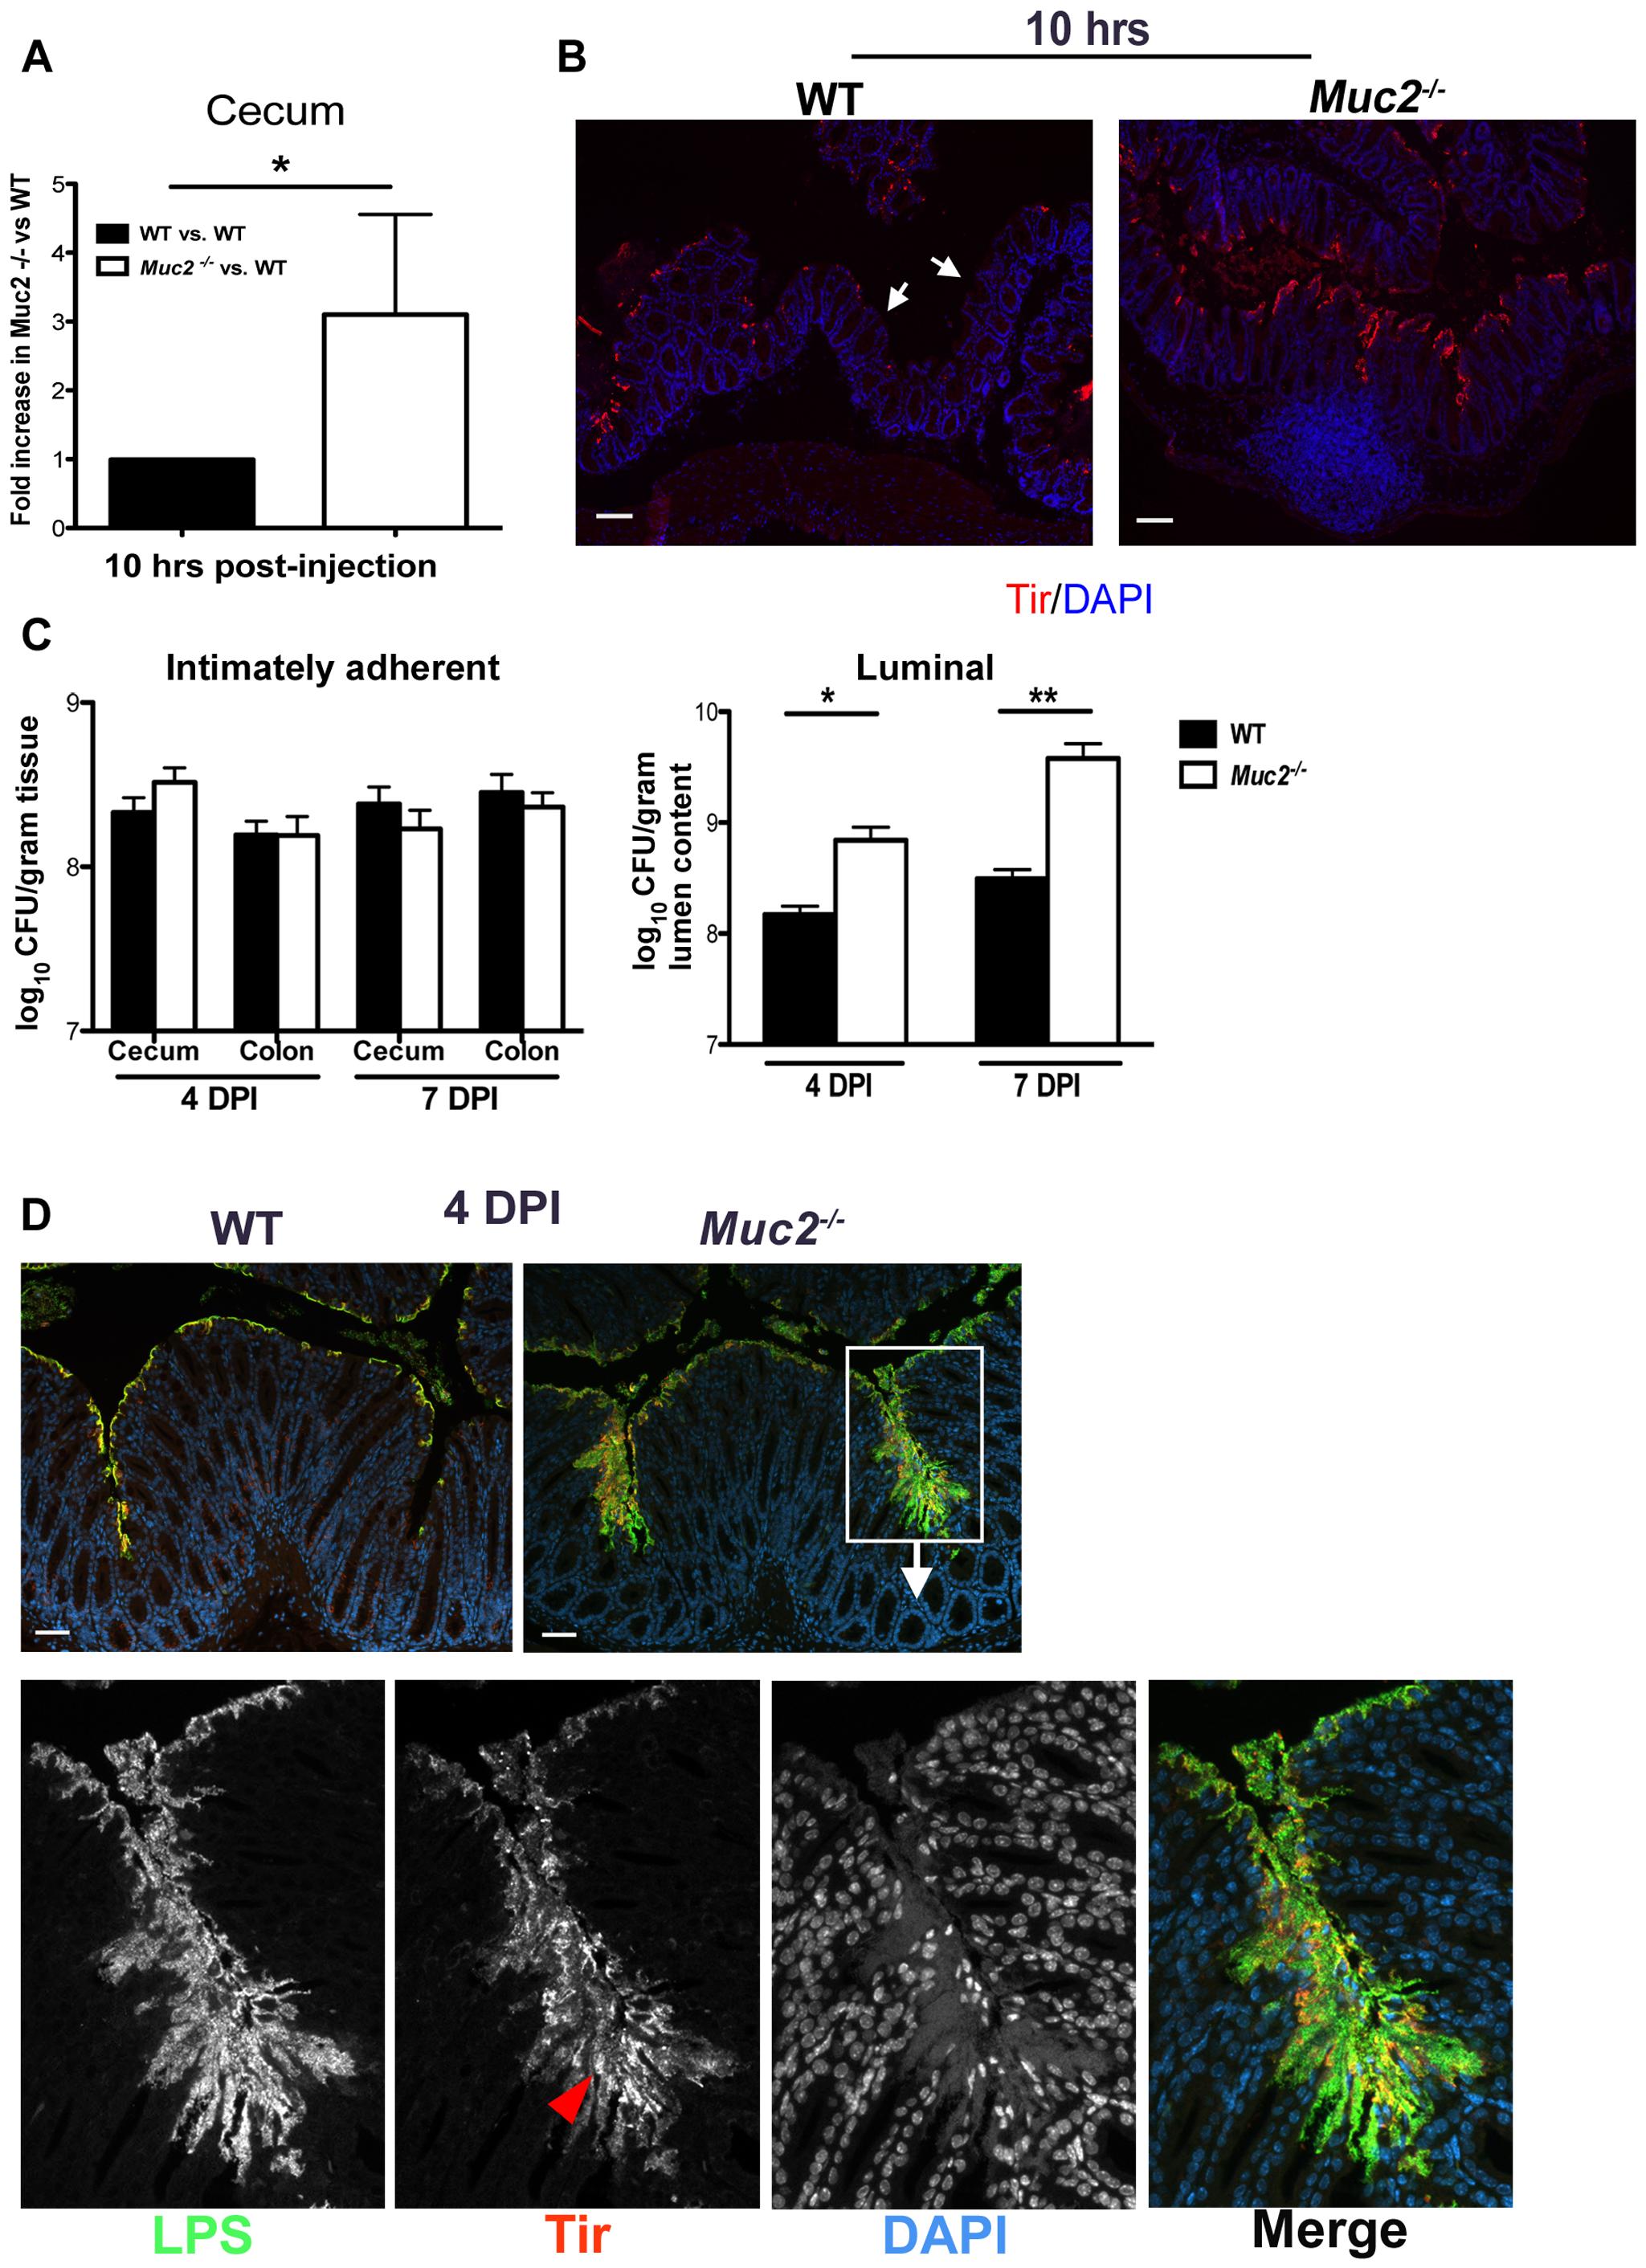 Muc2 limits initial colonization of the mucosal epithelia, but ultimately controls levels of luminal pathogen burdens.